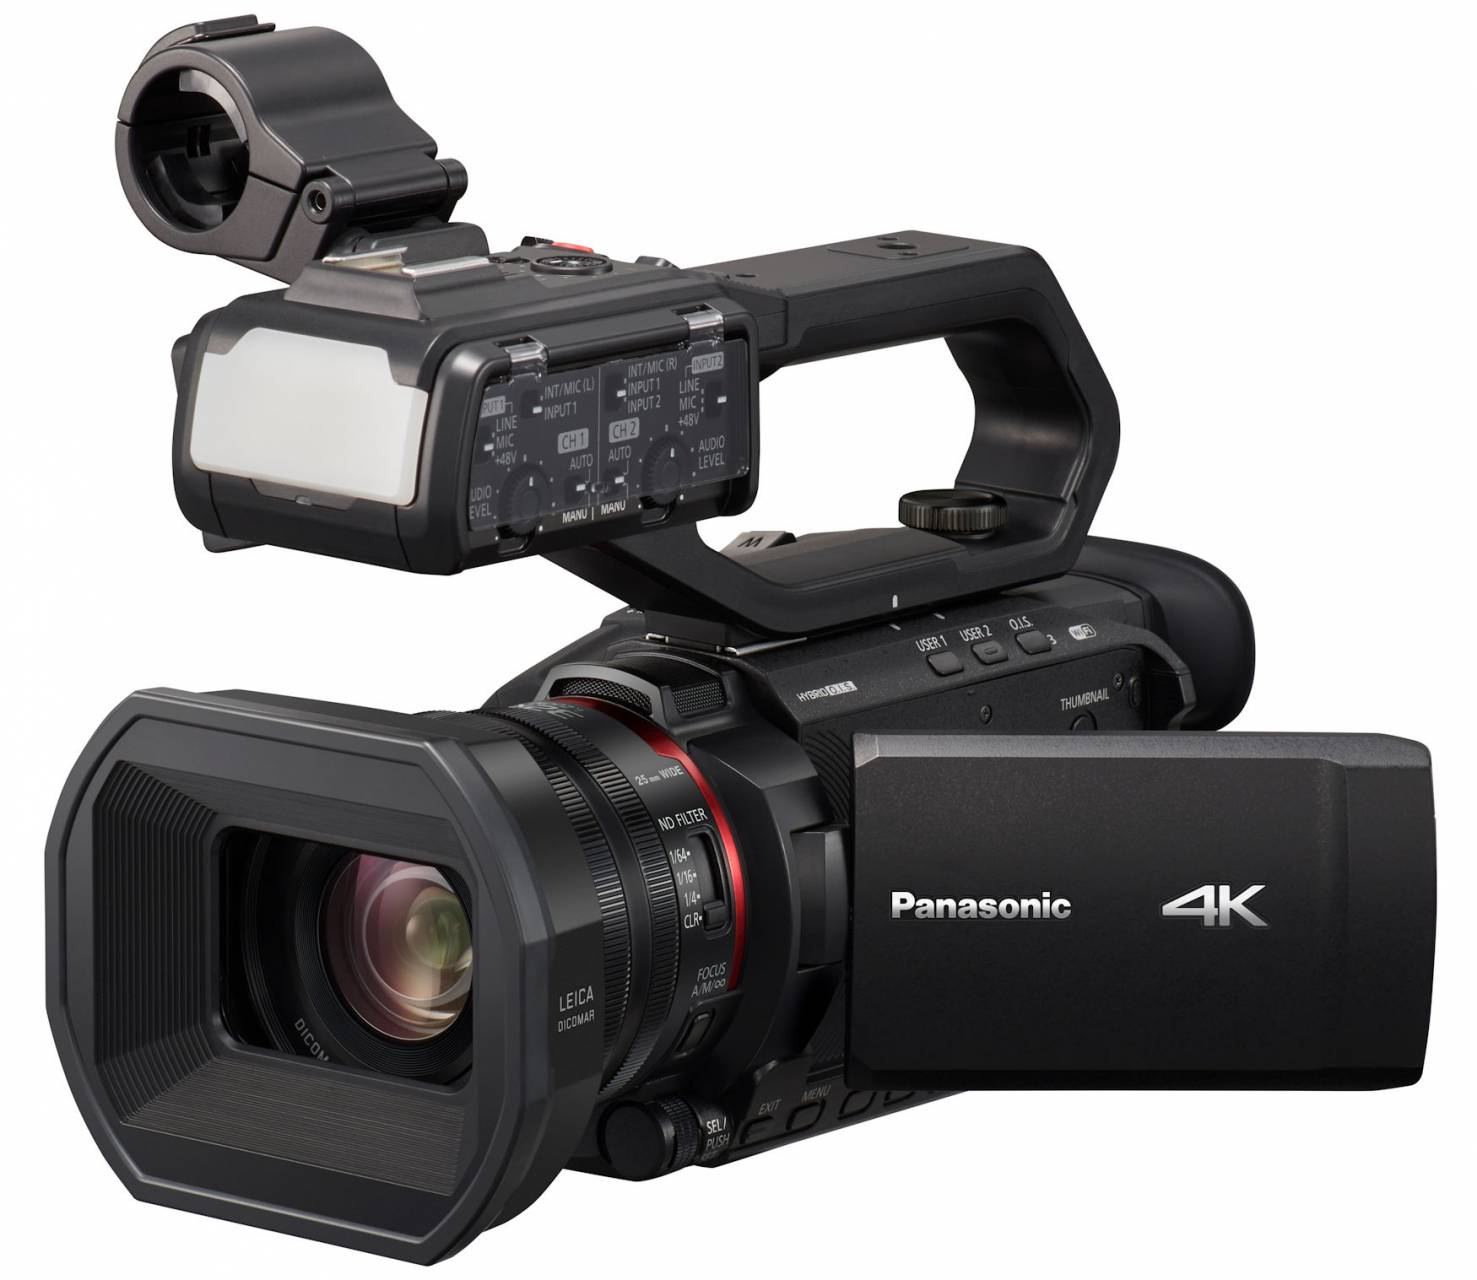 Panasonic HC-X2000 camcoder